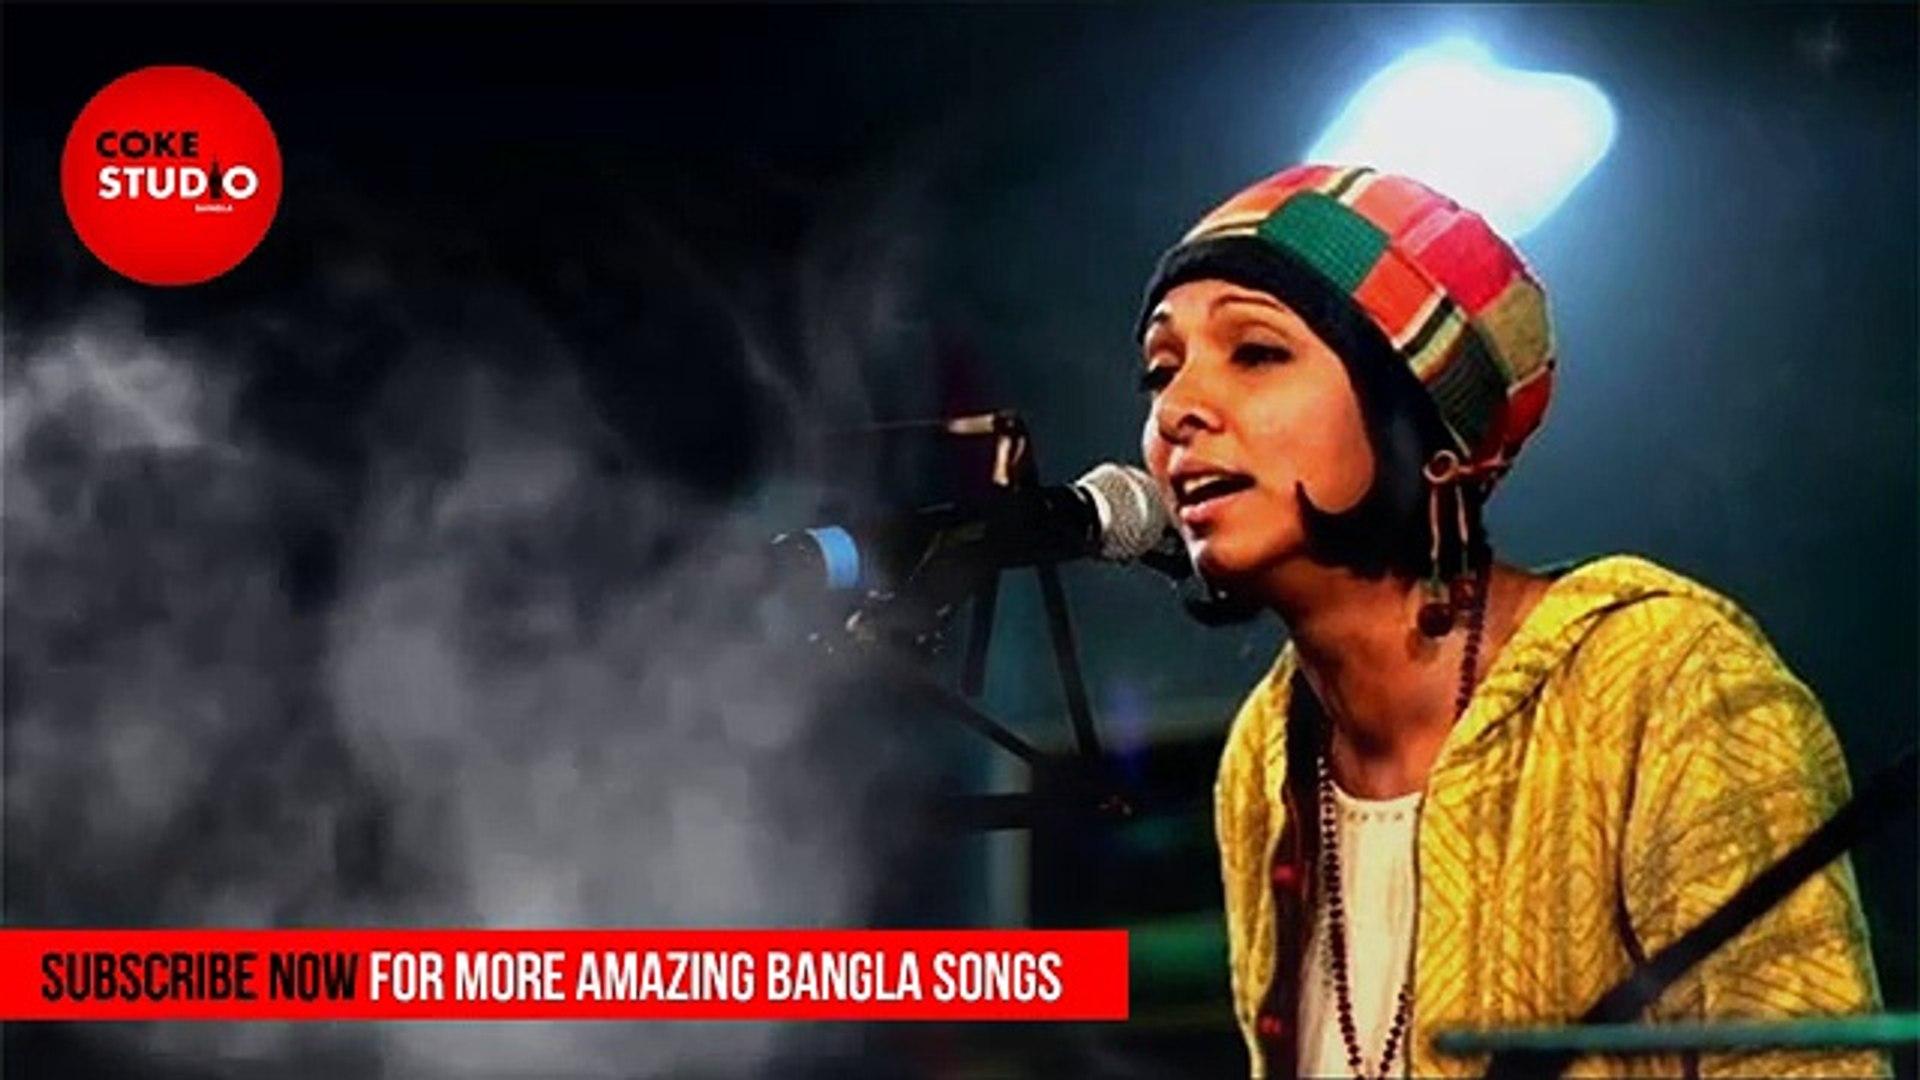 Tomay Hrid Majhare Rakhbo ( হৃদ মাঝারে ) ft  Anusheh Anadil - Coke Studio  Bangla Song 2016